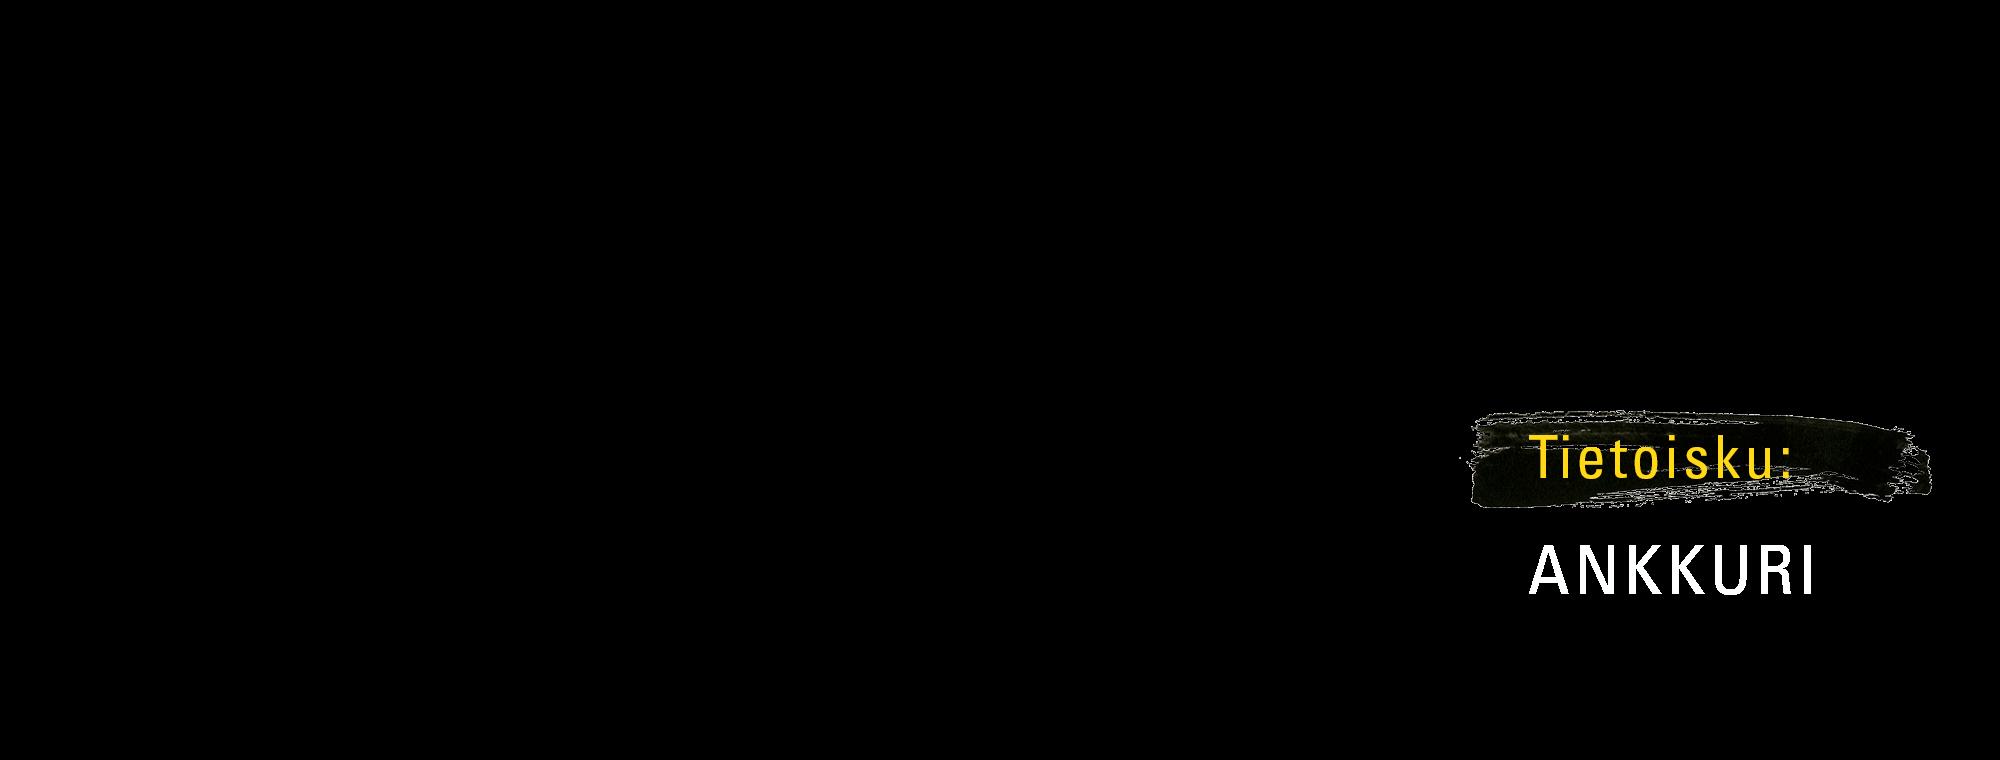 Ankkuri